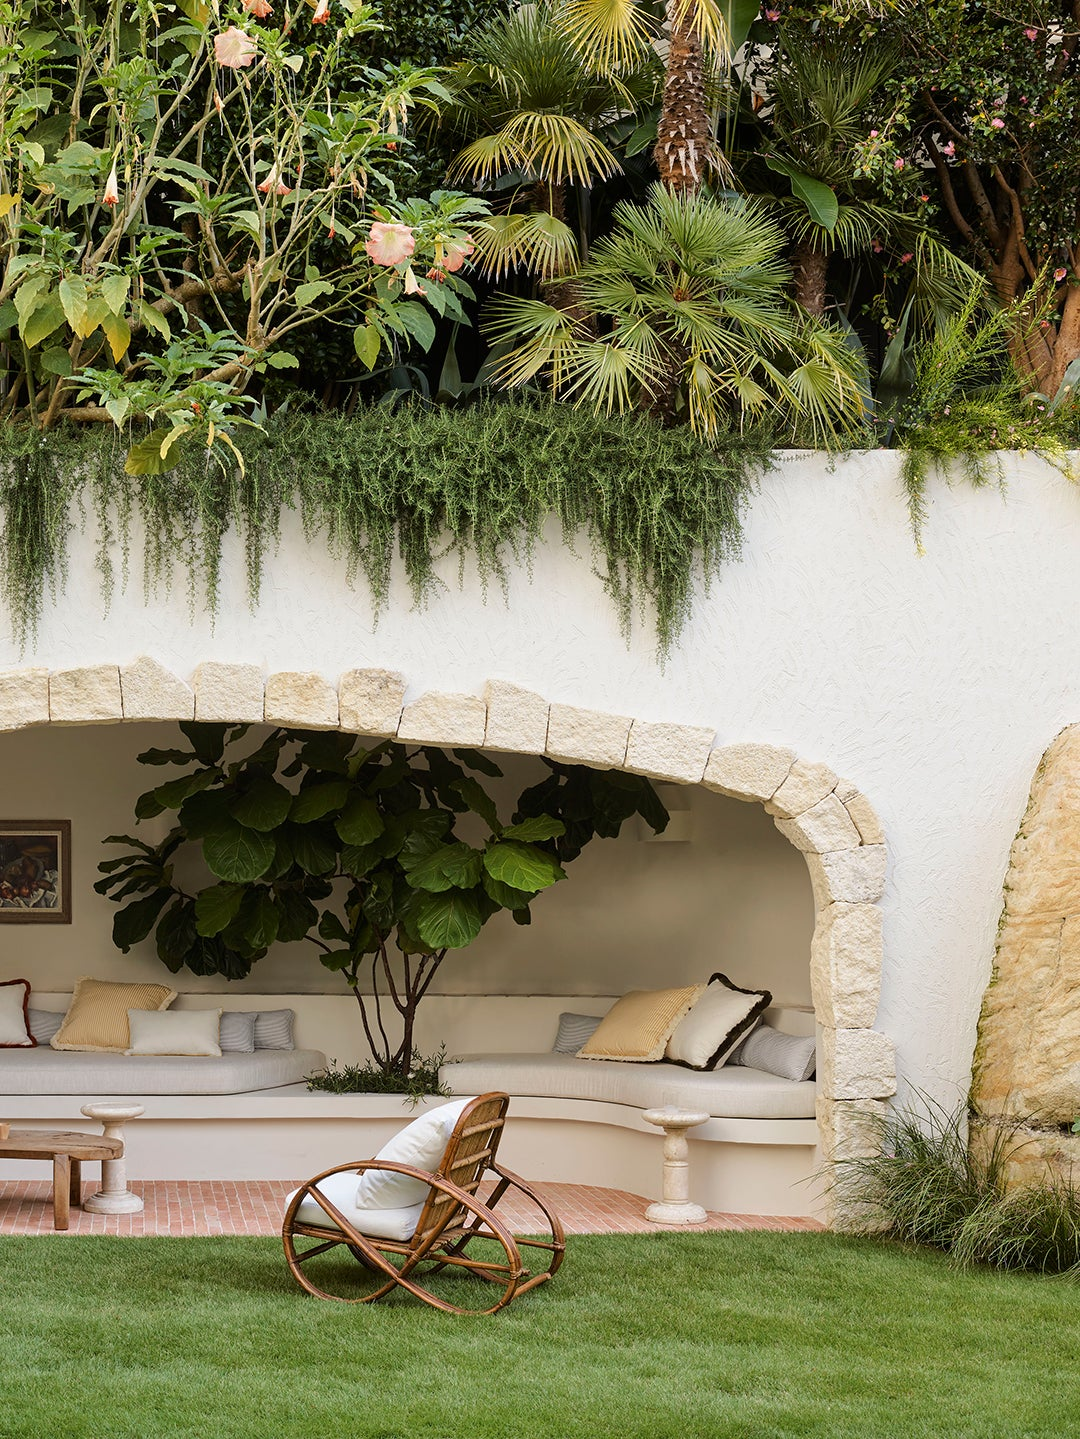 00-FEATURE-outdoor-australian-grotto-design-domino